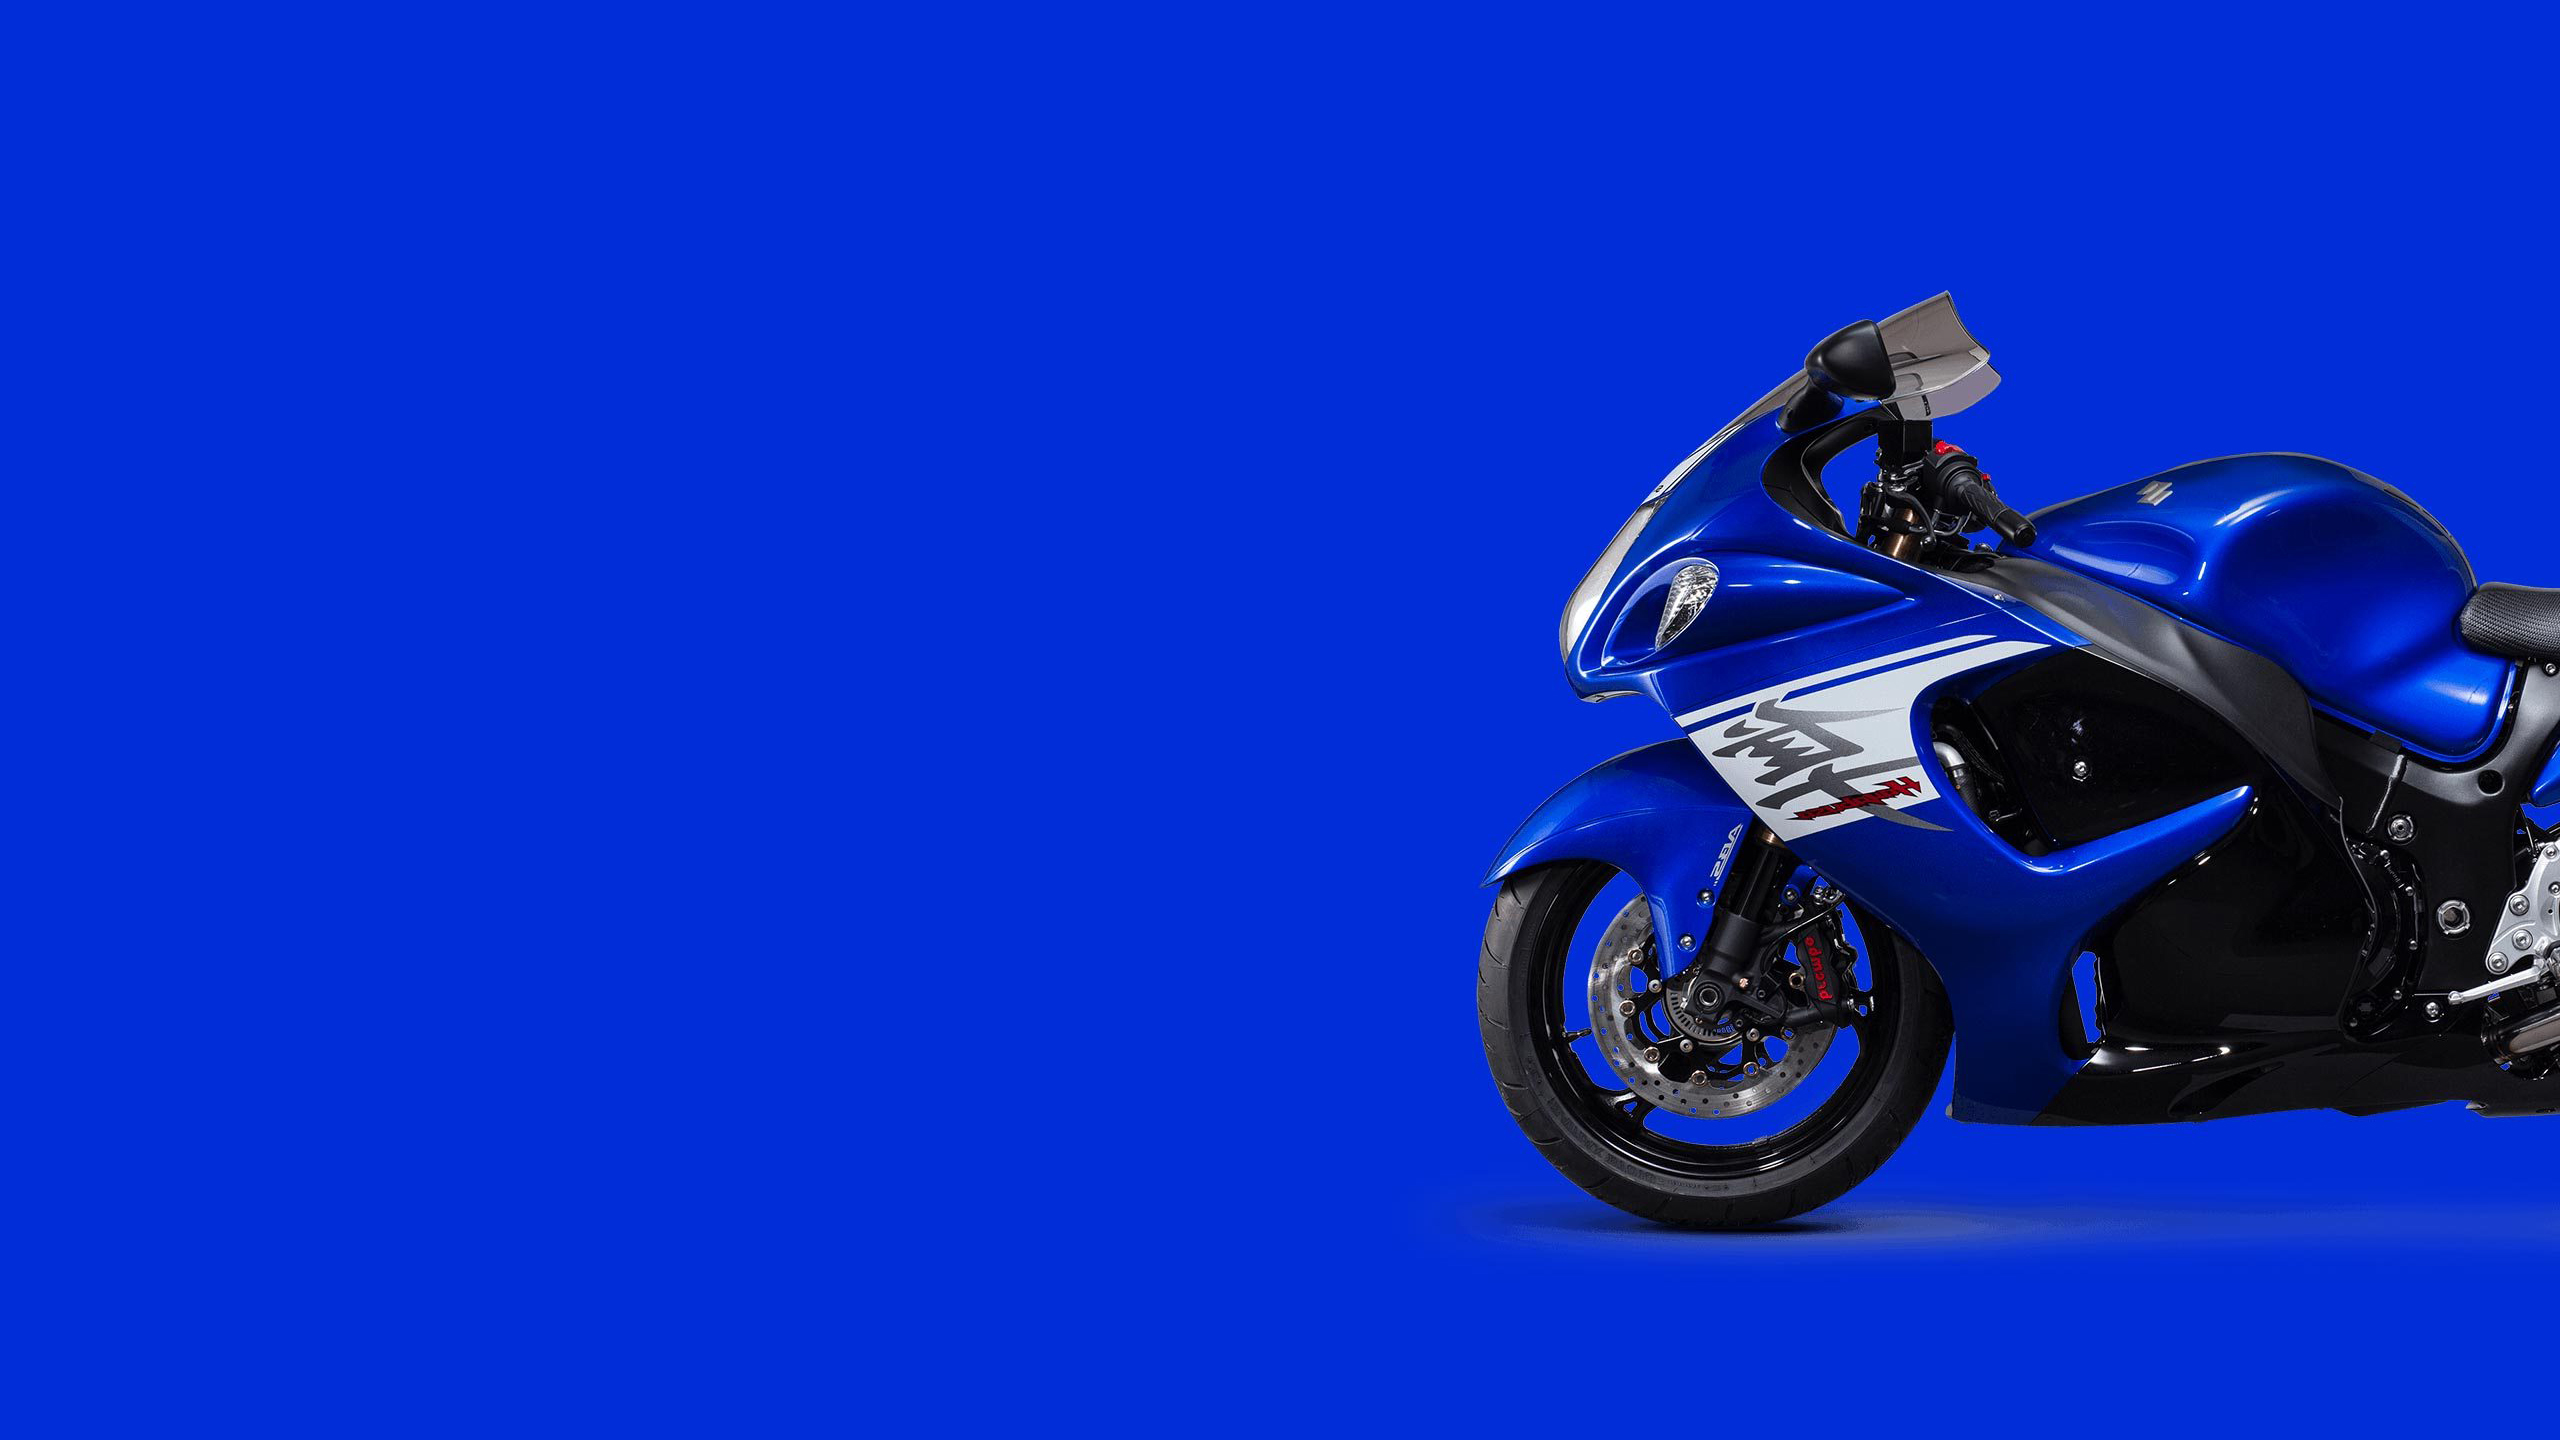 Suzuki hayabusa синий обои скачать